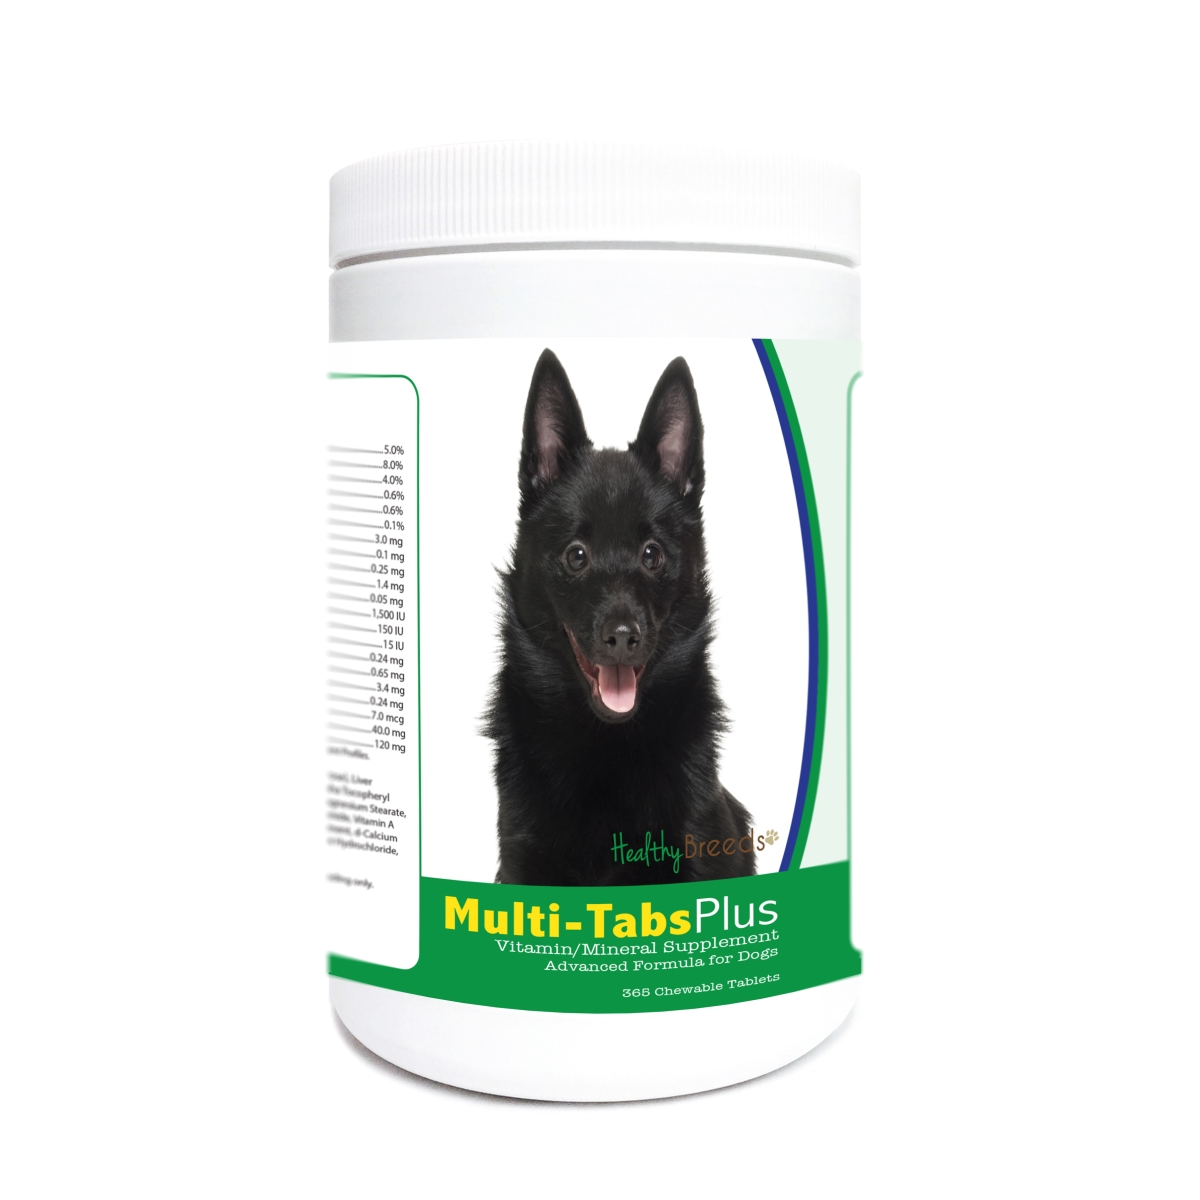 Healthy Breeds 840235173878 Schipperke Multi-Tabs Plus Chewable Tablets - 365 Count